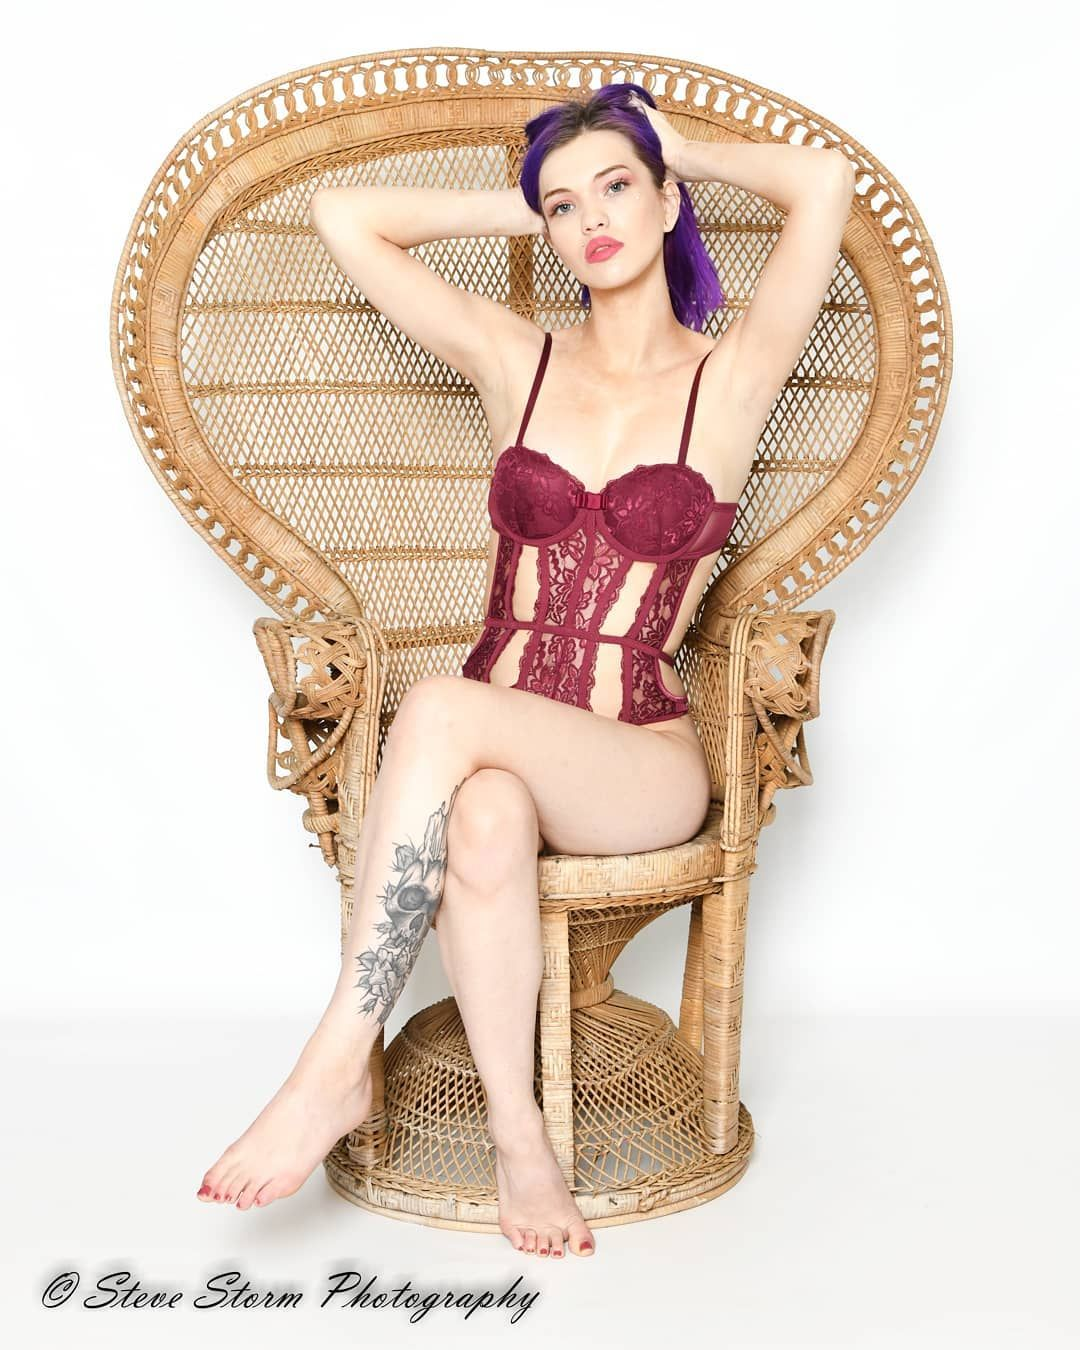 #stevestormphotography #pnwphotographer #nikonphoto #d850 #studio #studioshoot #photoshoot #sanpedrostudio #boudoir #lingerie #tattoo #girlswithtattoos #instagrampic #peacockchair #model #igmodel #igphoto #igpic #photooftheday #picoftheday #instagrampic #instagram  Model: @ms.dxlicious